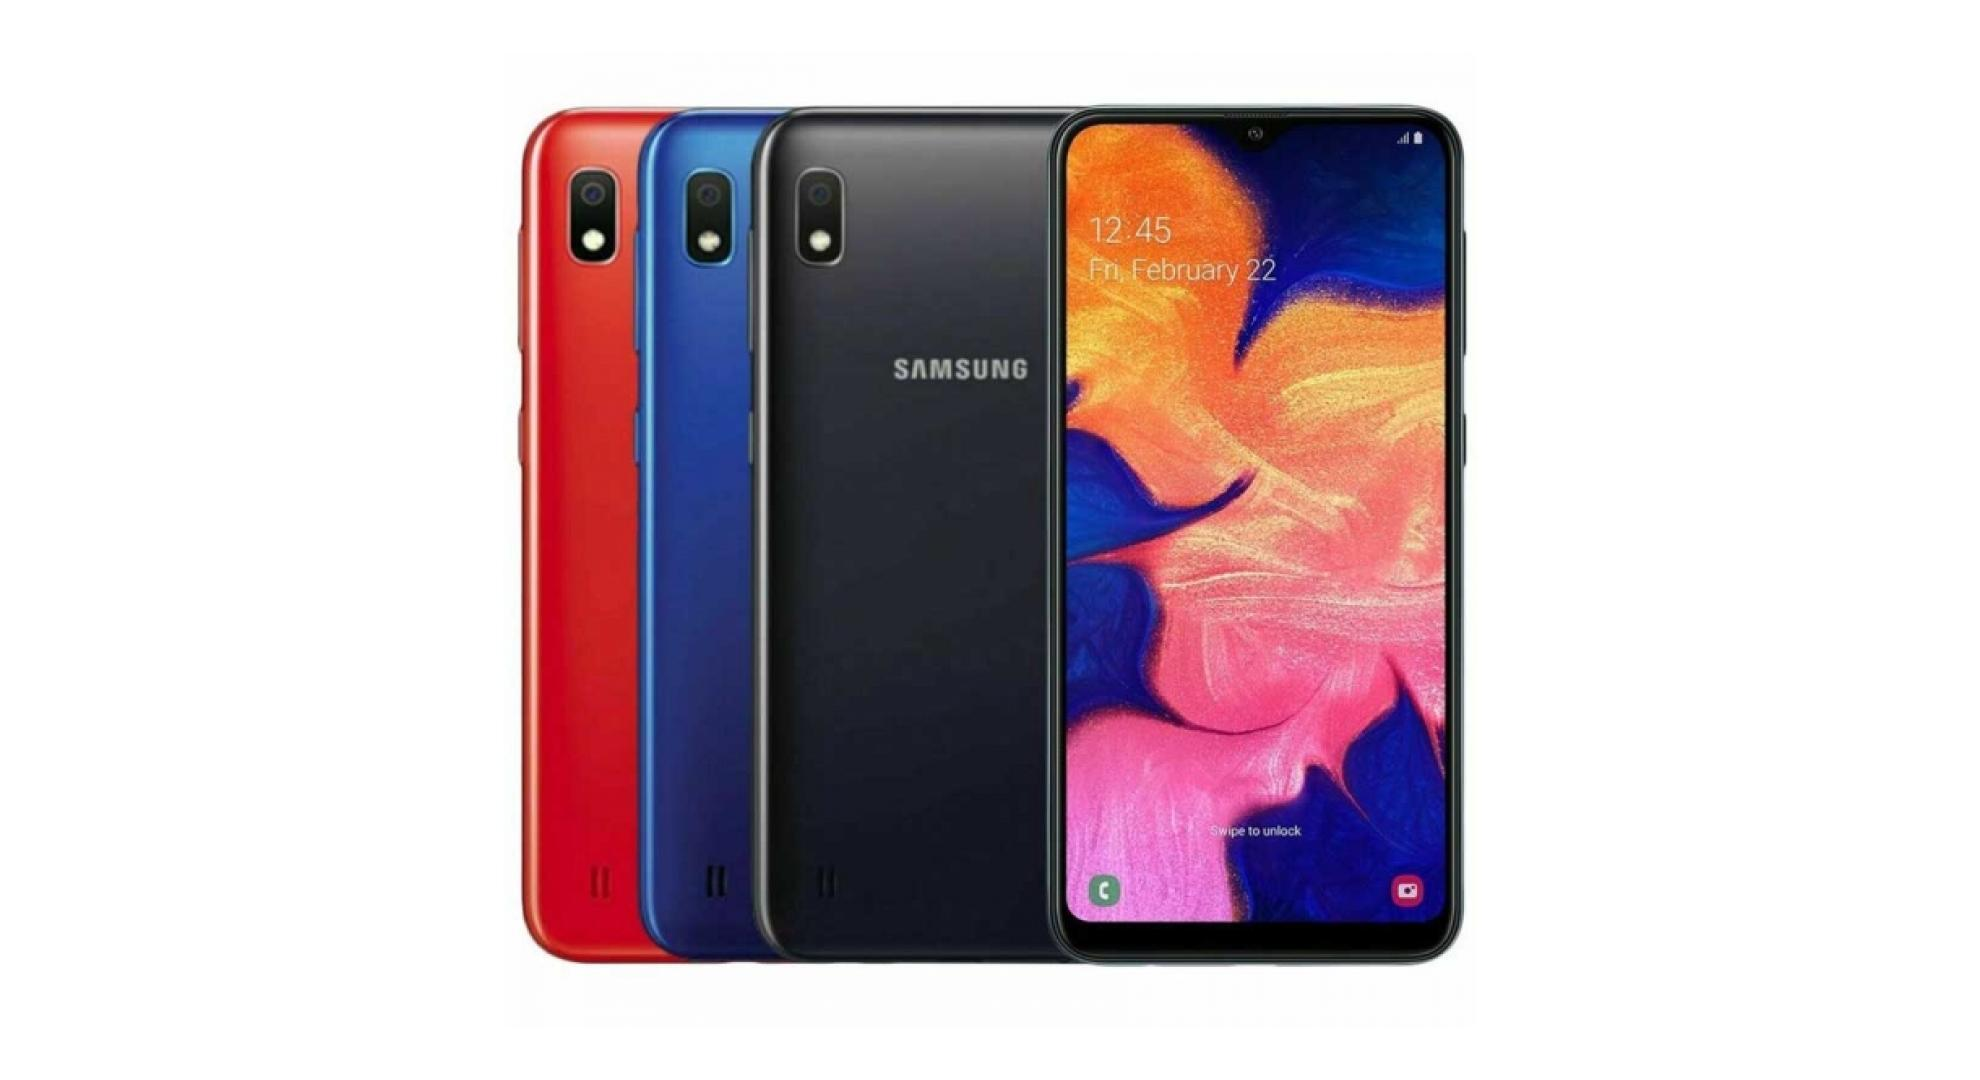 Où acheter le Samsung Galaxy A10 au meilleur prix en 2020 ?